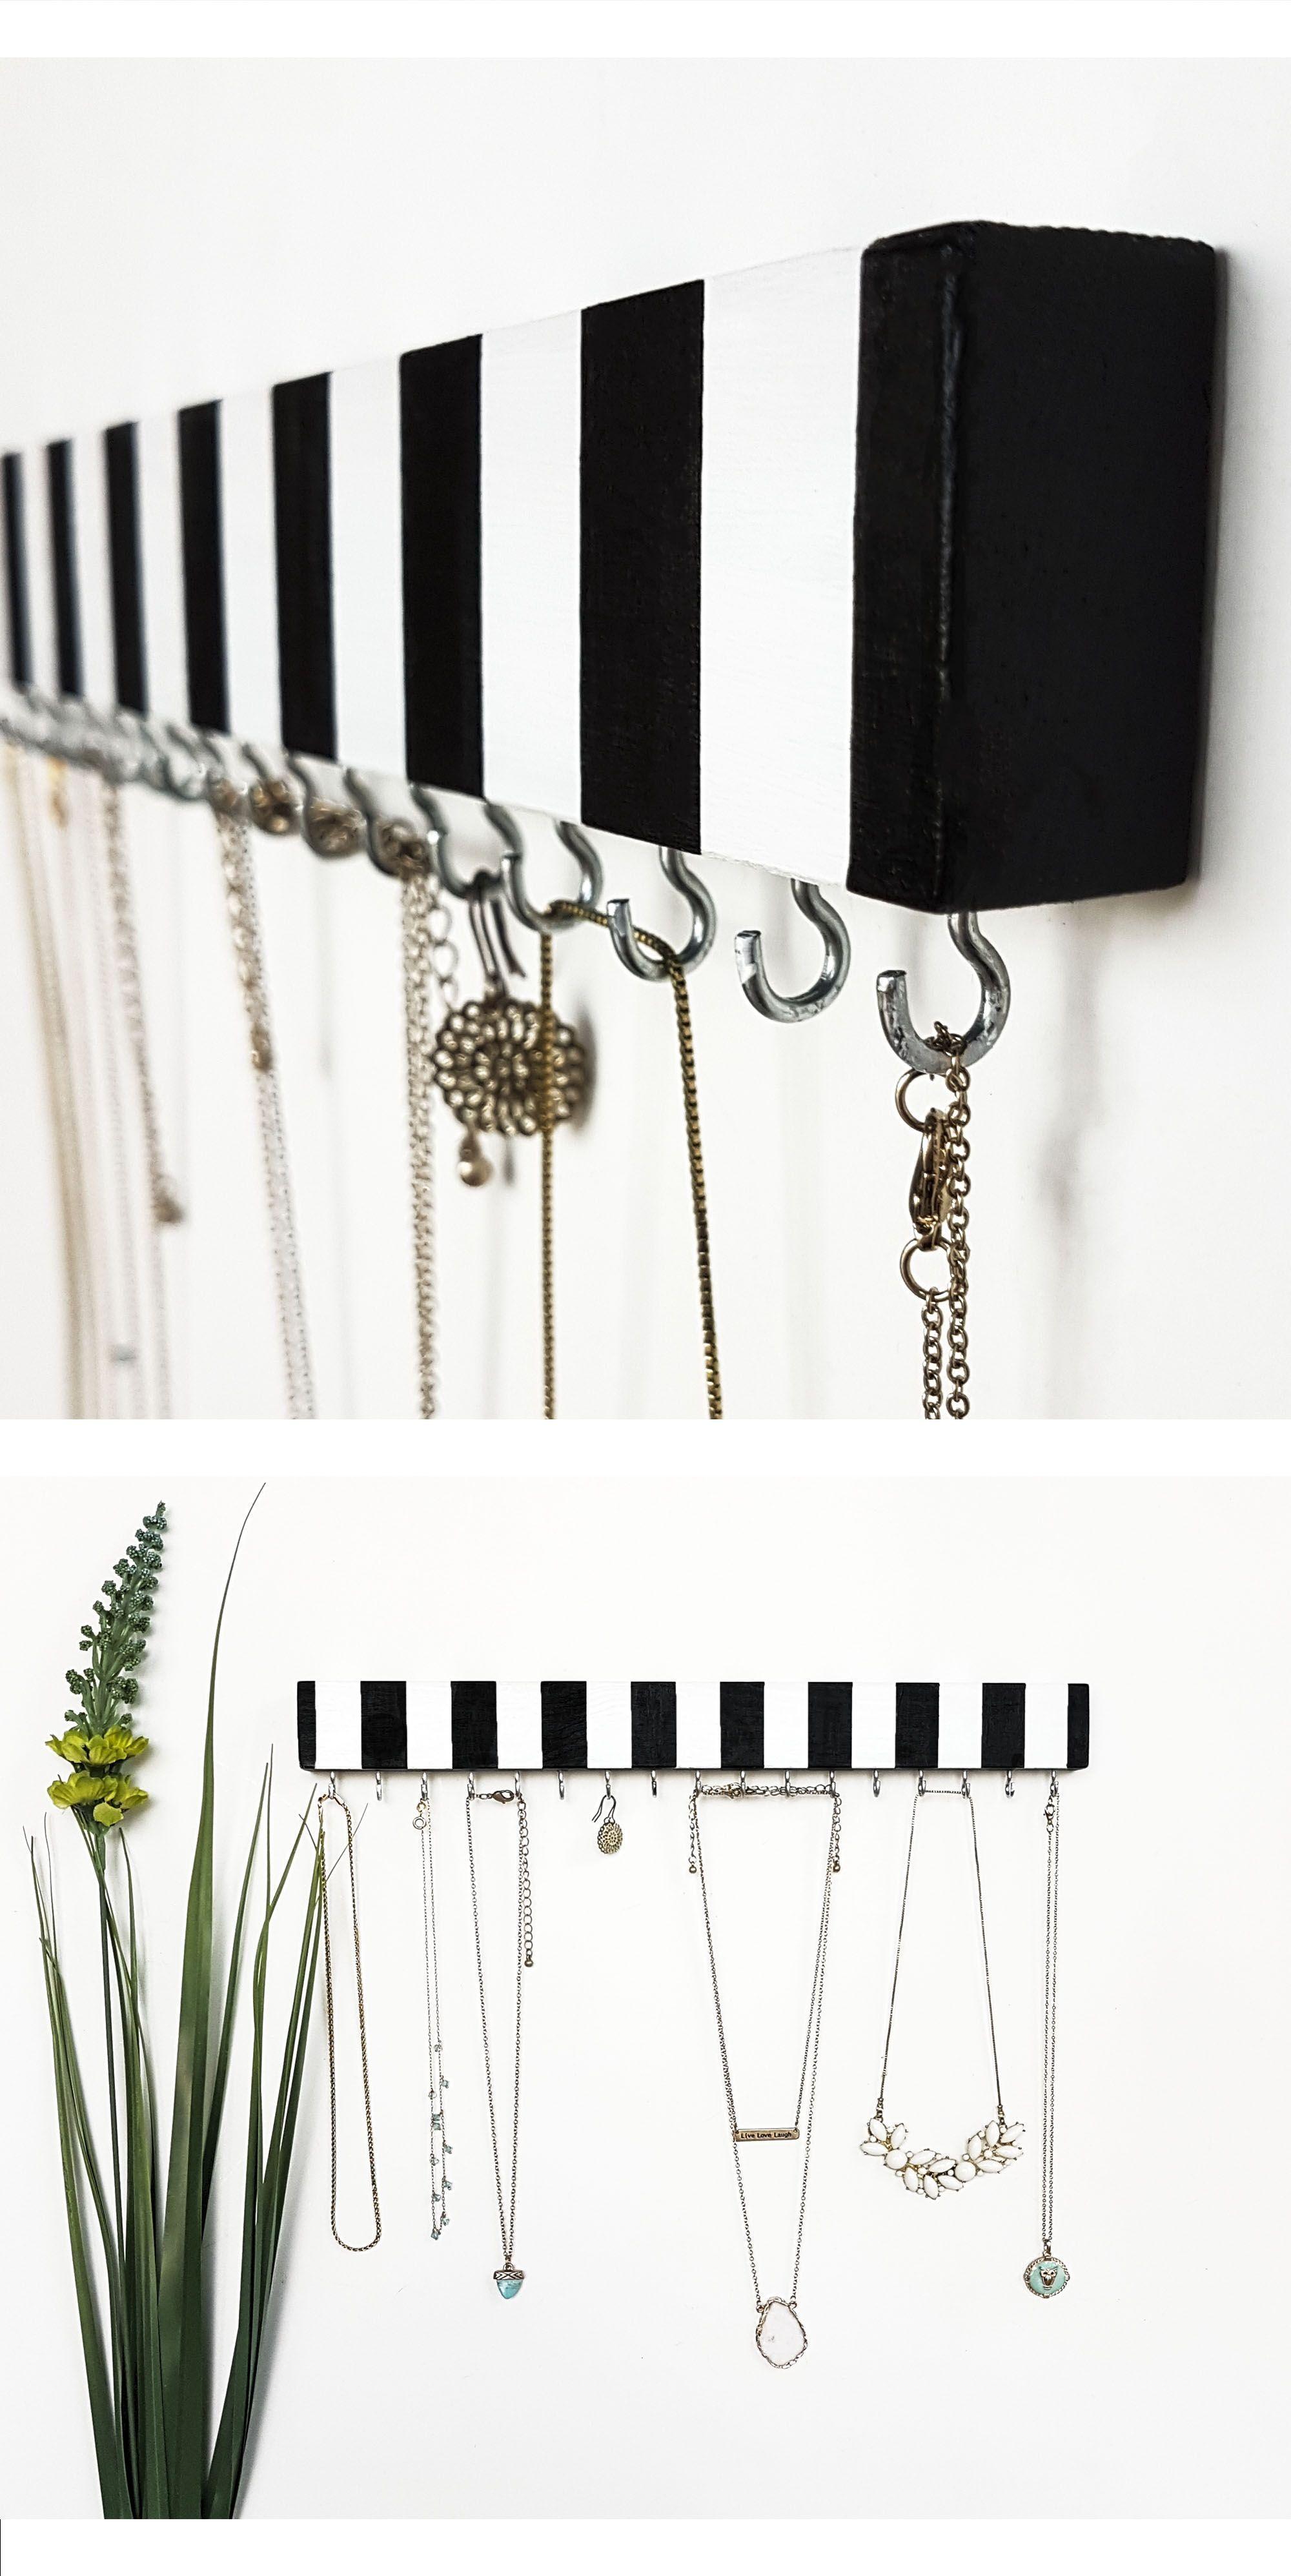 Necklace Holder Organizer Black And White Design Handmade Item Made Of Wood Acrylic Diy Display Jewelry Storage Hanger